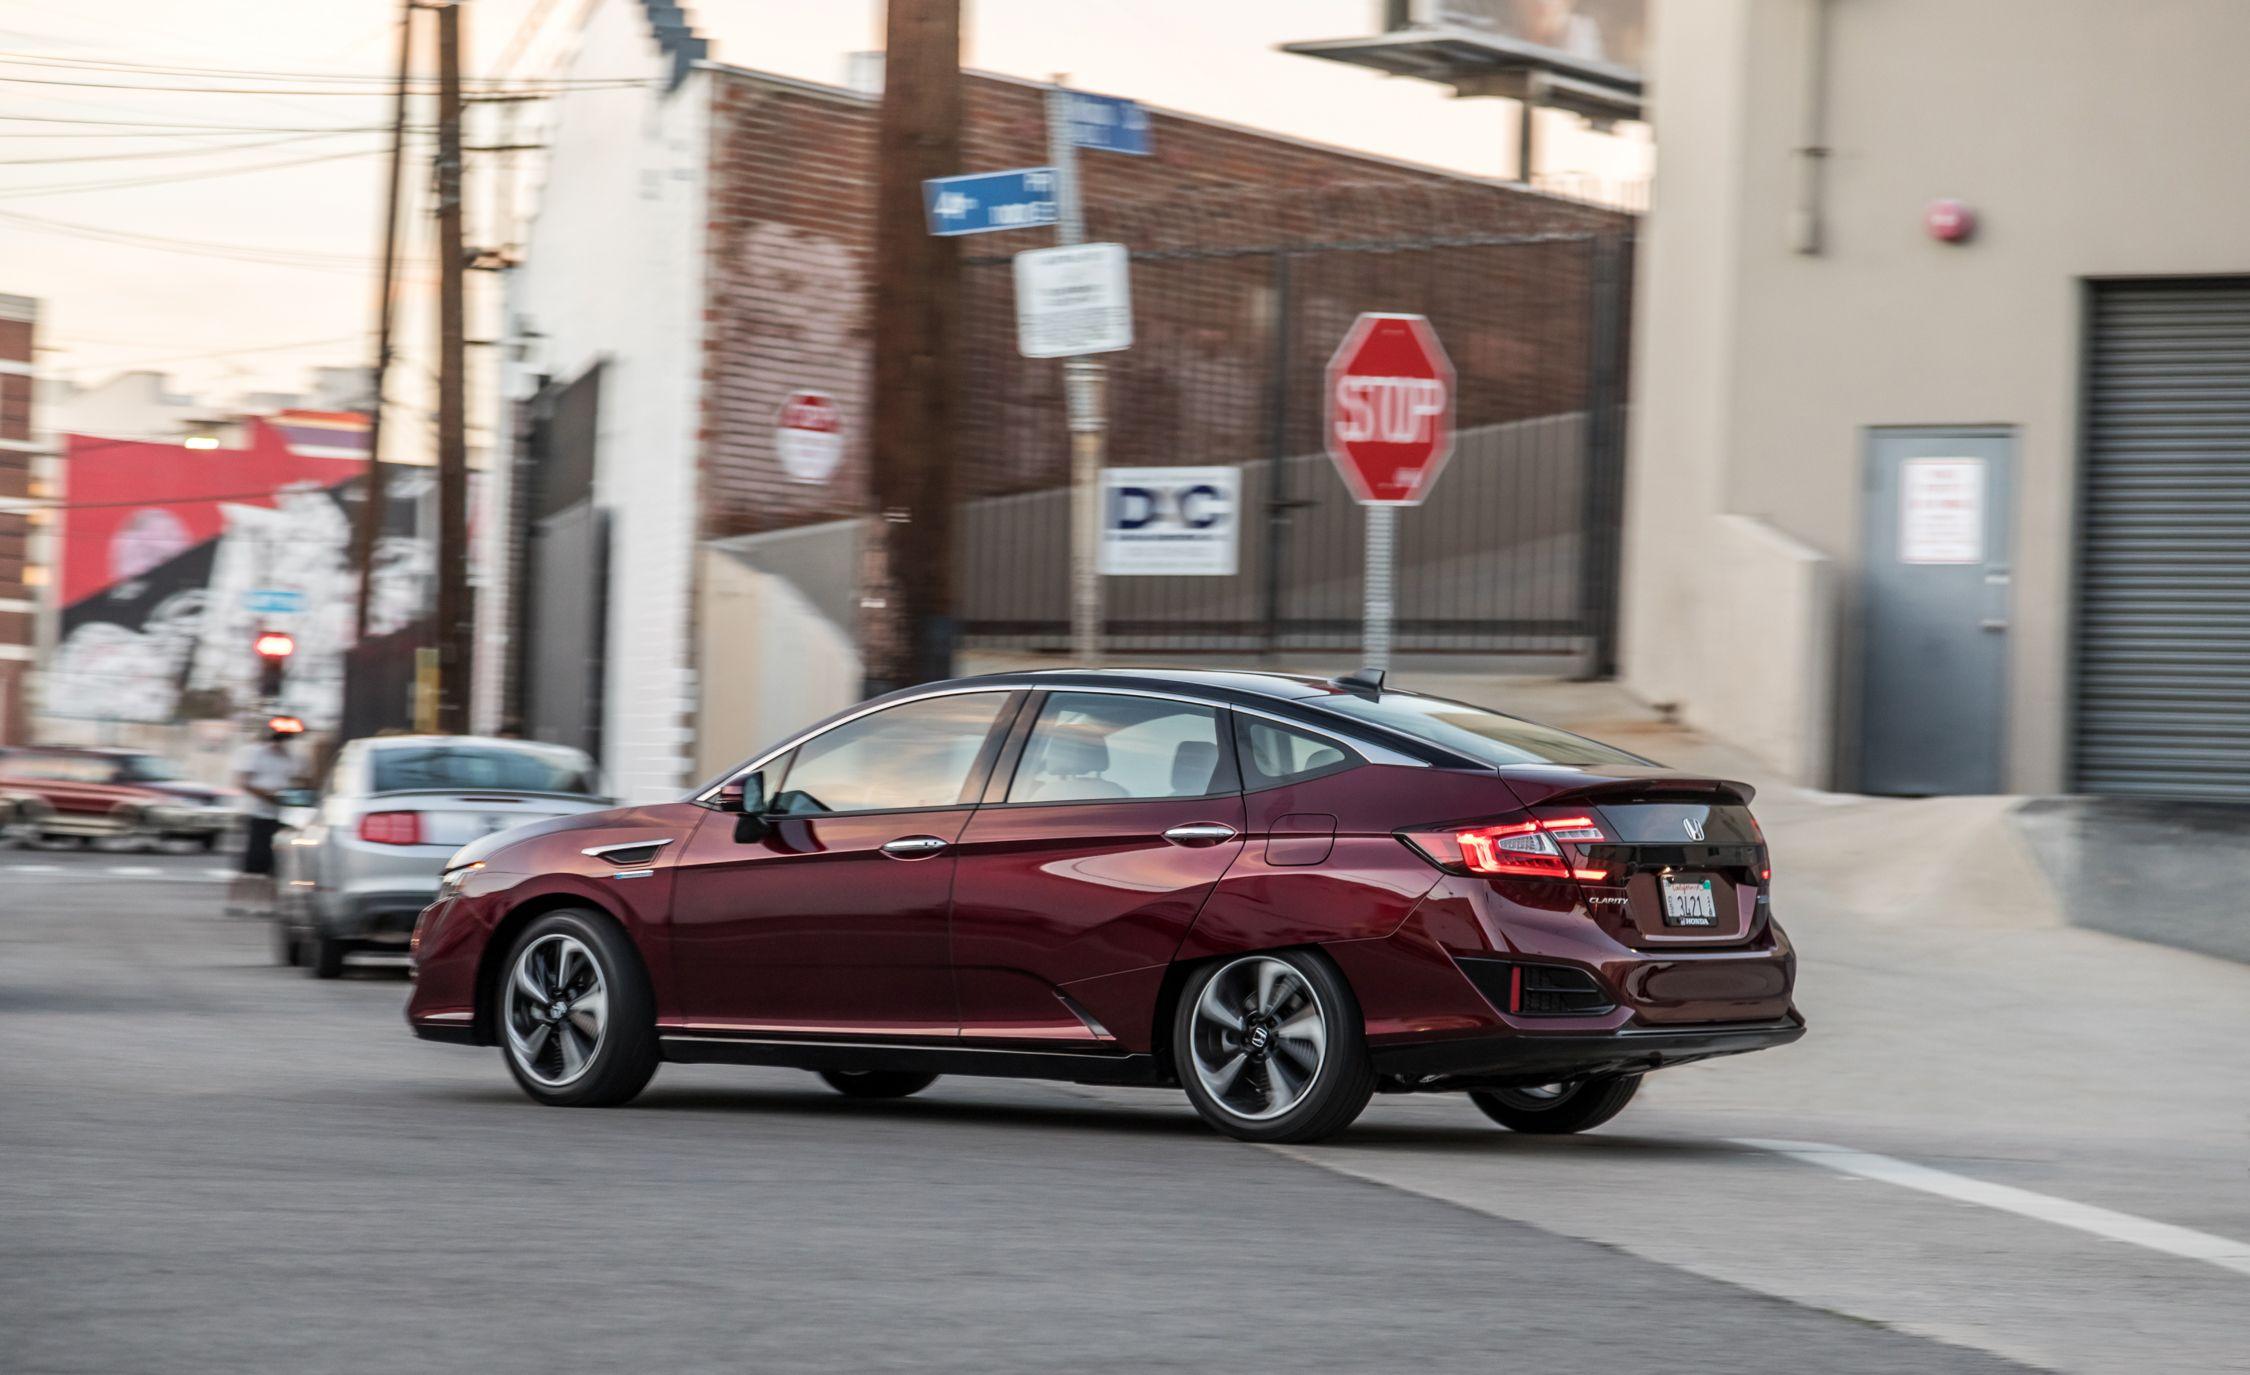 2017 Honda Clarity Fuel Cell Photo Gallery